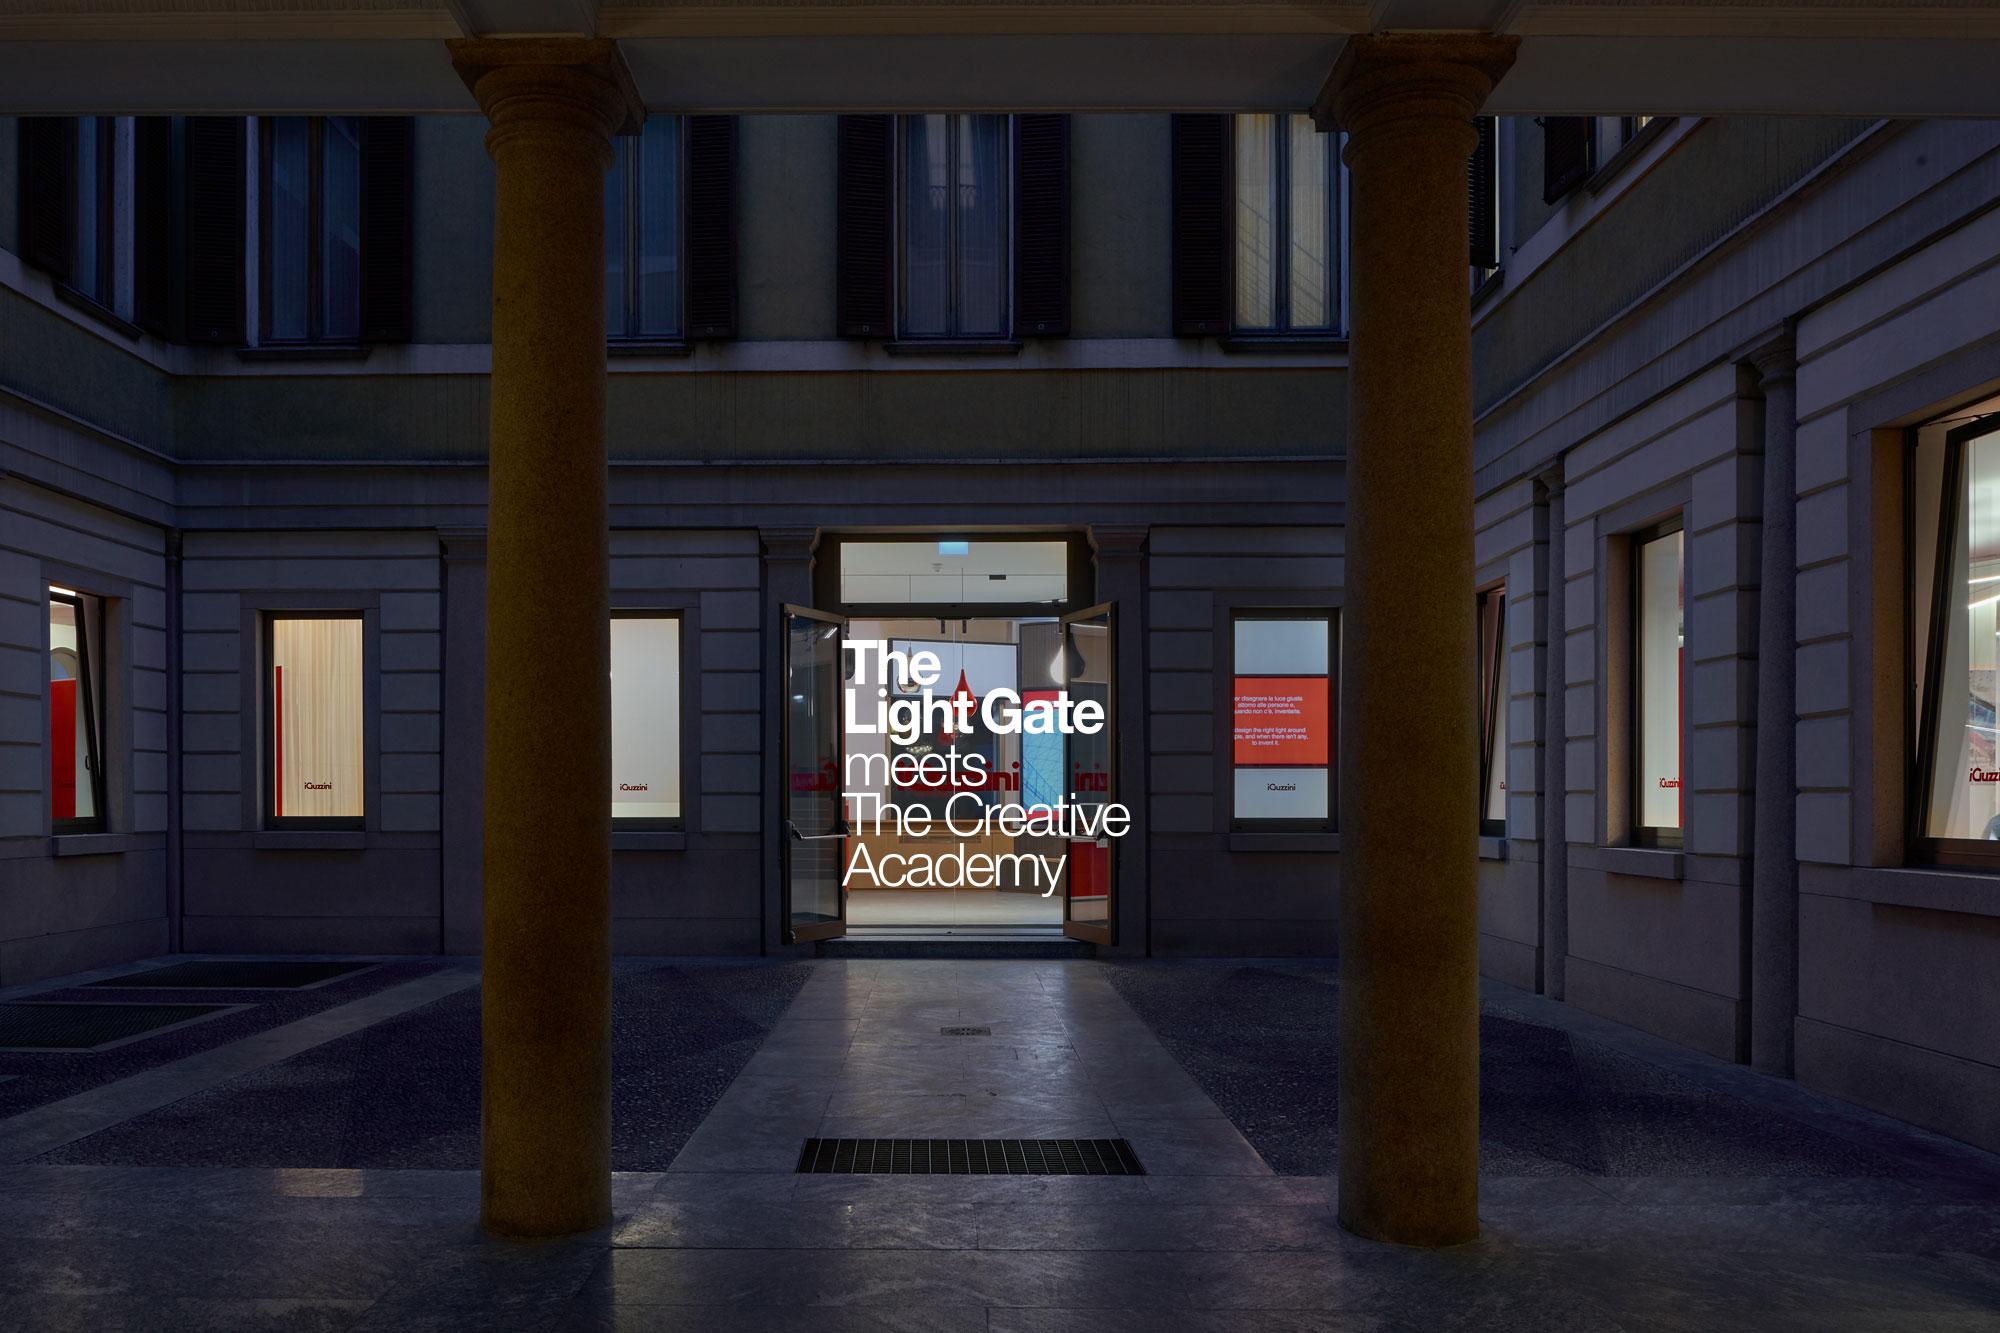 iGuzzini illuminazione und Creative Academy auf dem Fuorisalone 2019